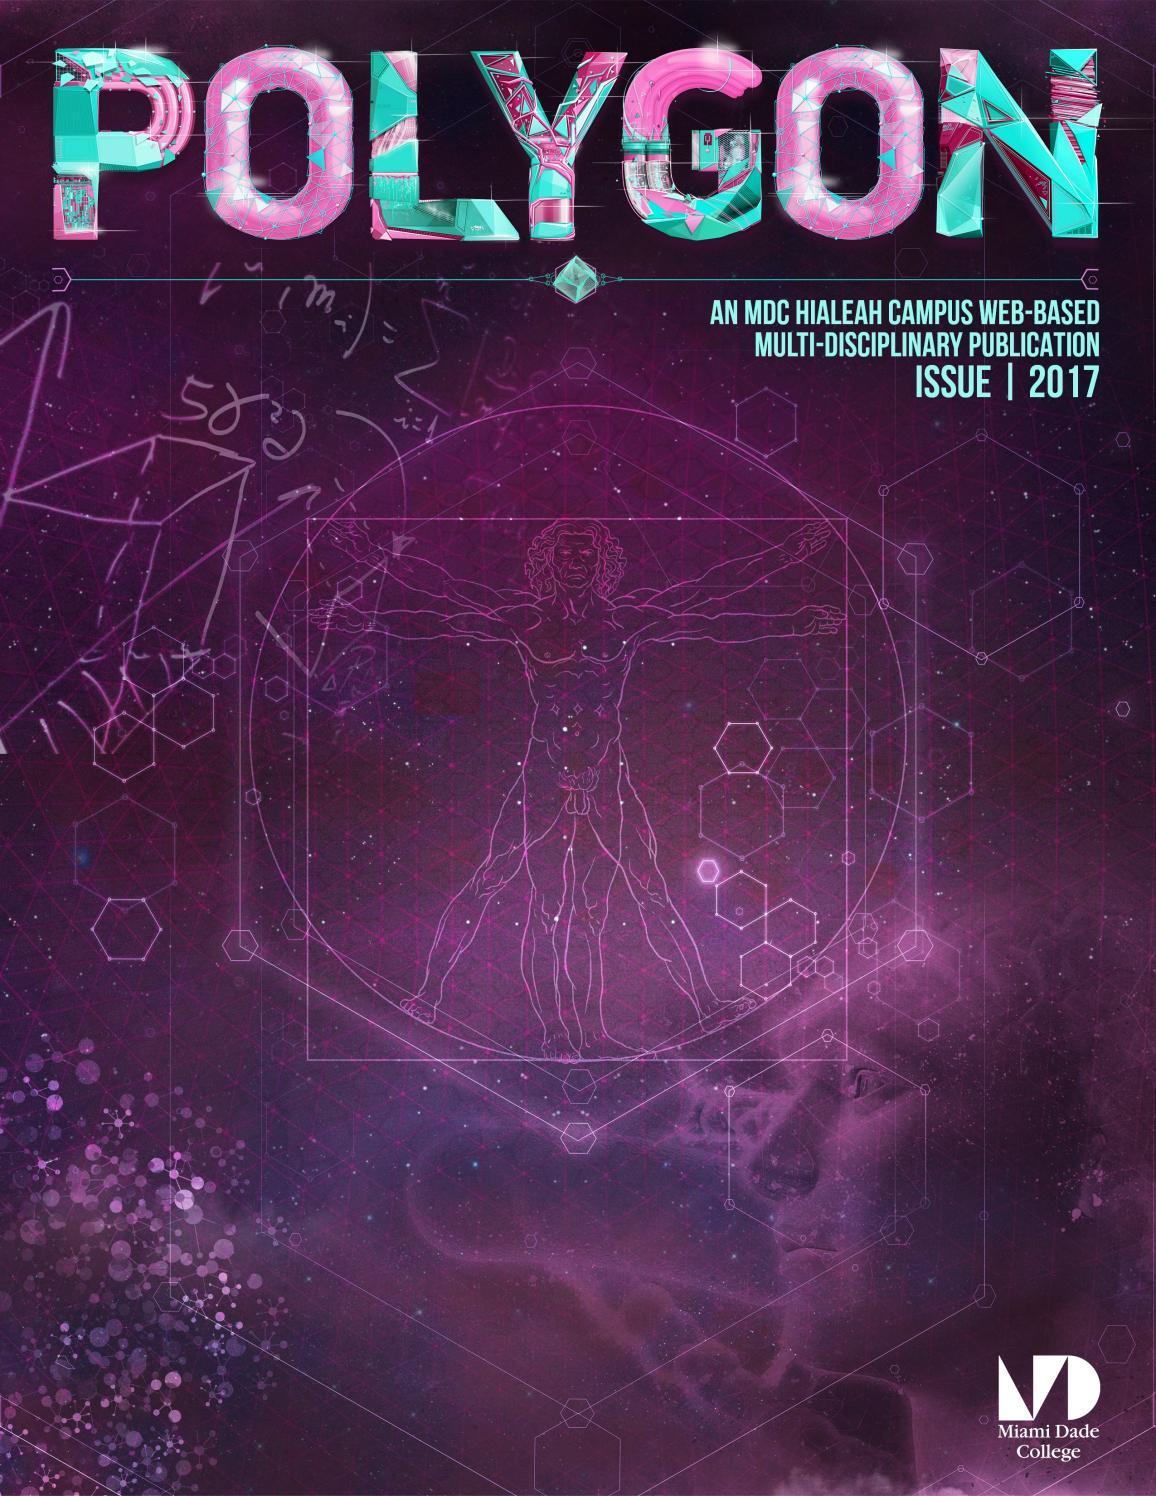 stewart calculus 4th edition solutions pdf